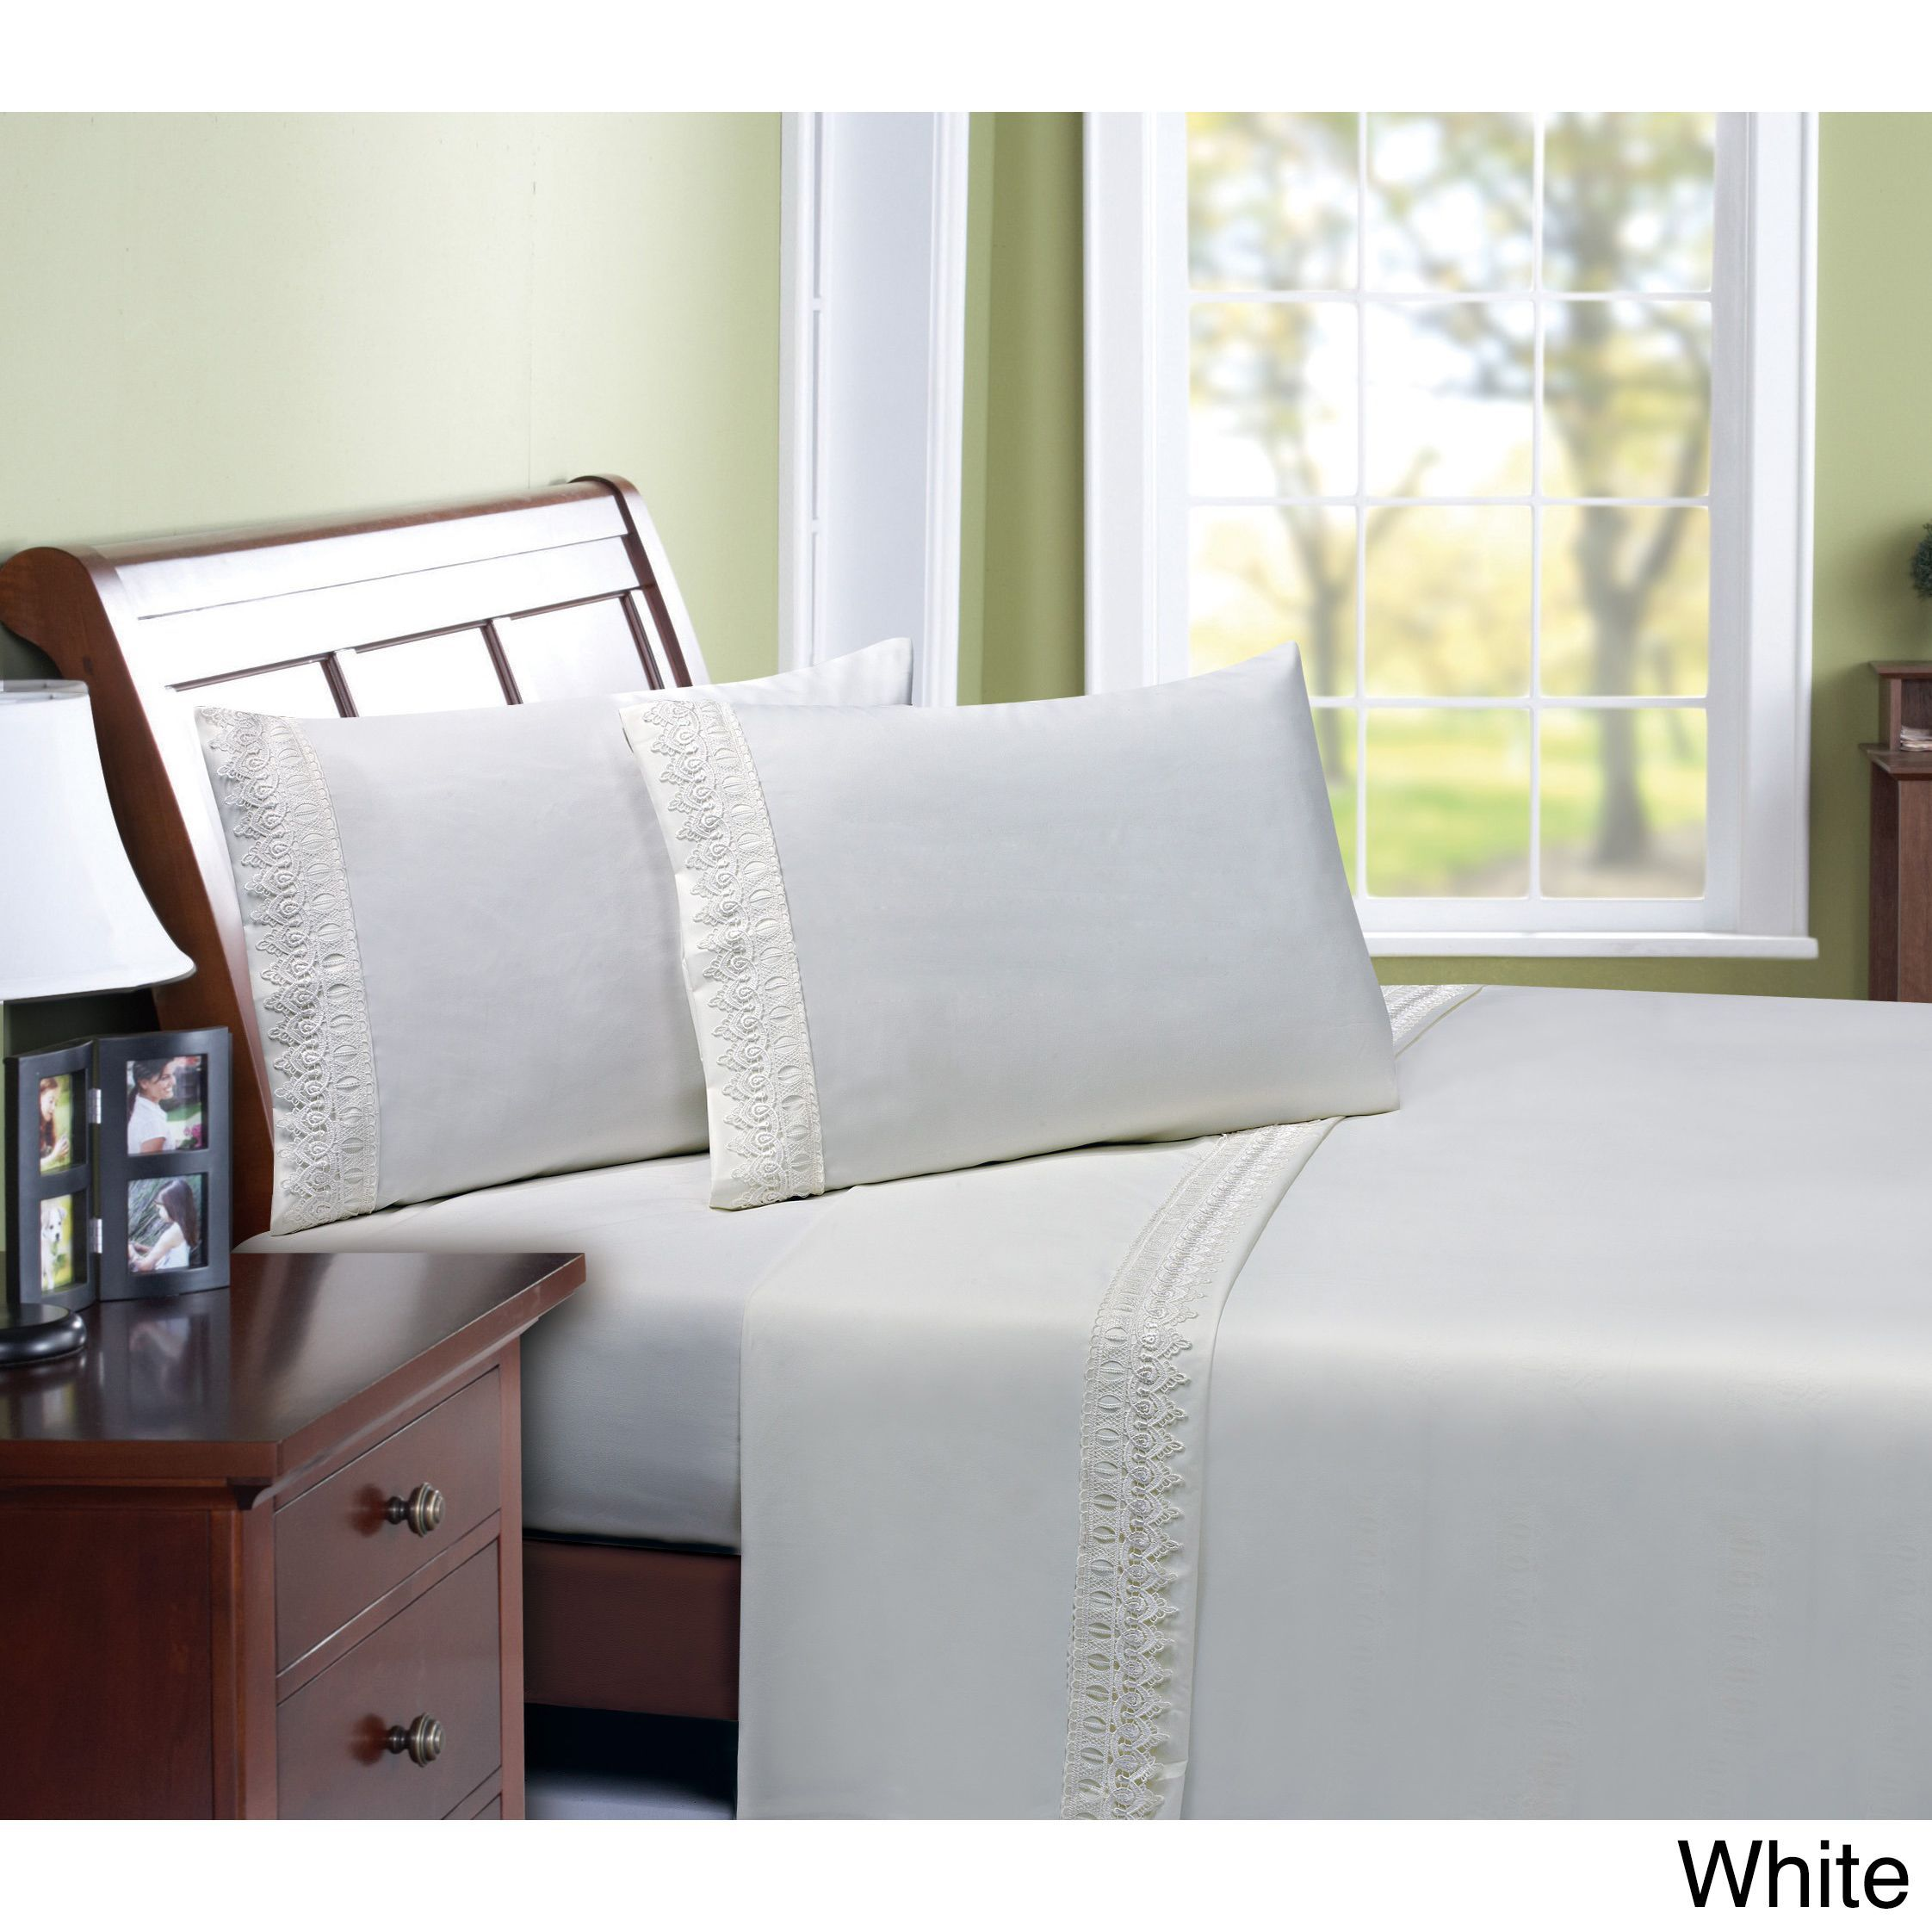 4-piece Ultra-soft Venician Lace Sheet Set